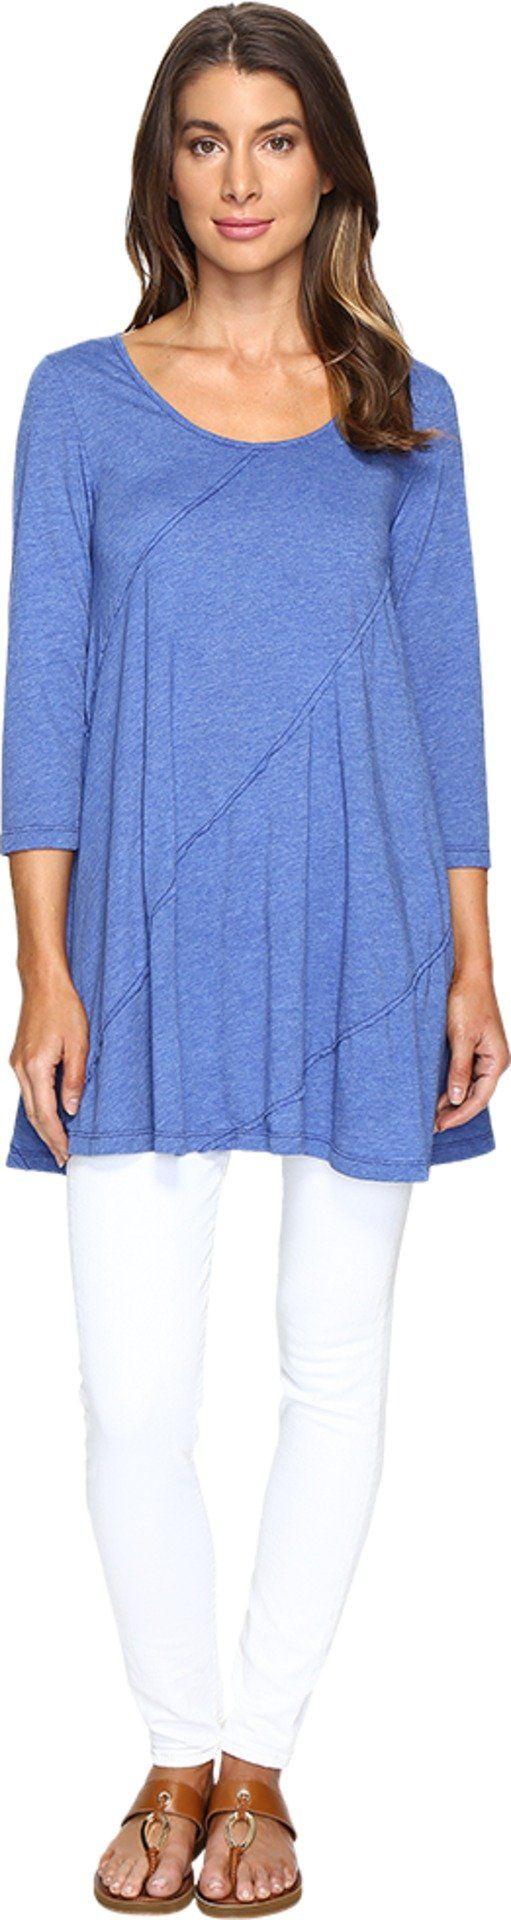 Mod-o-doc Women's Heather Jersey 3/4 Sleeve Swing Tunic Nautical Shirt